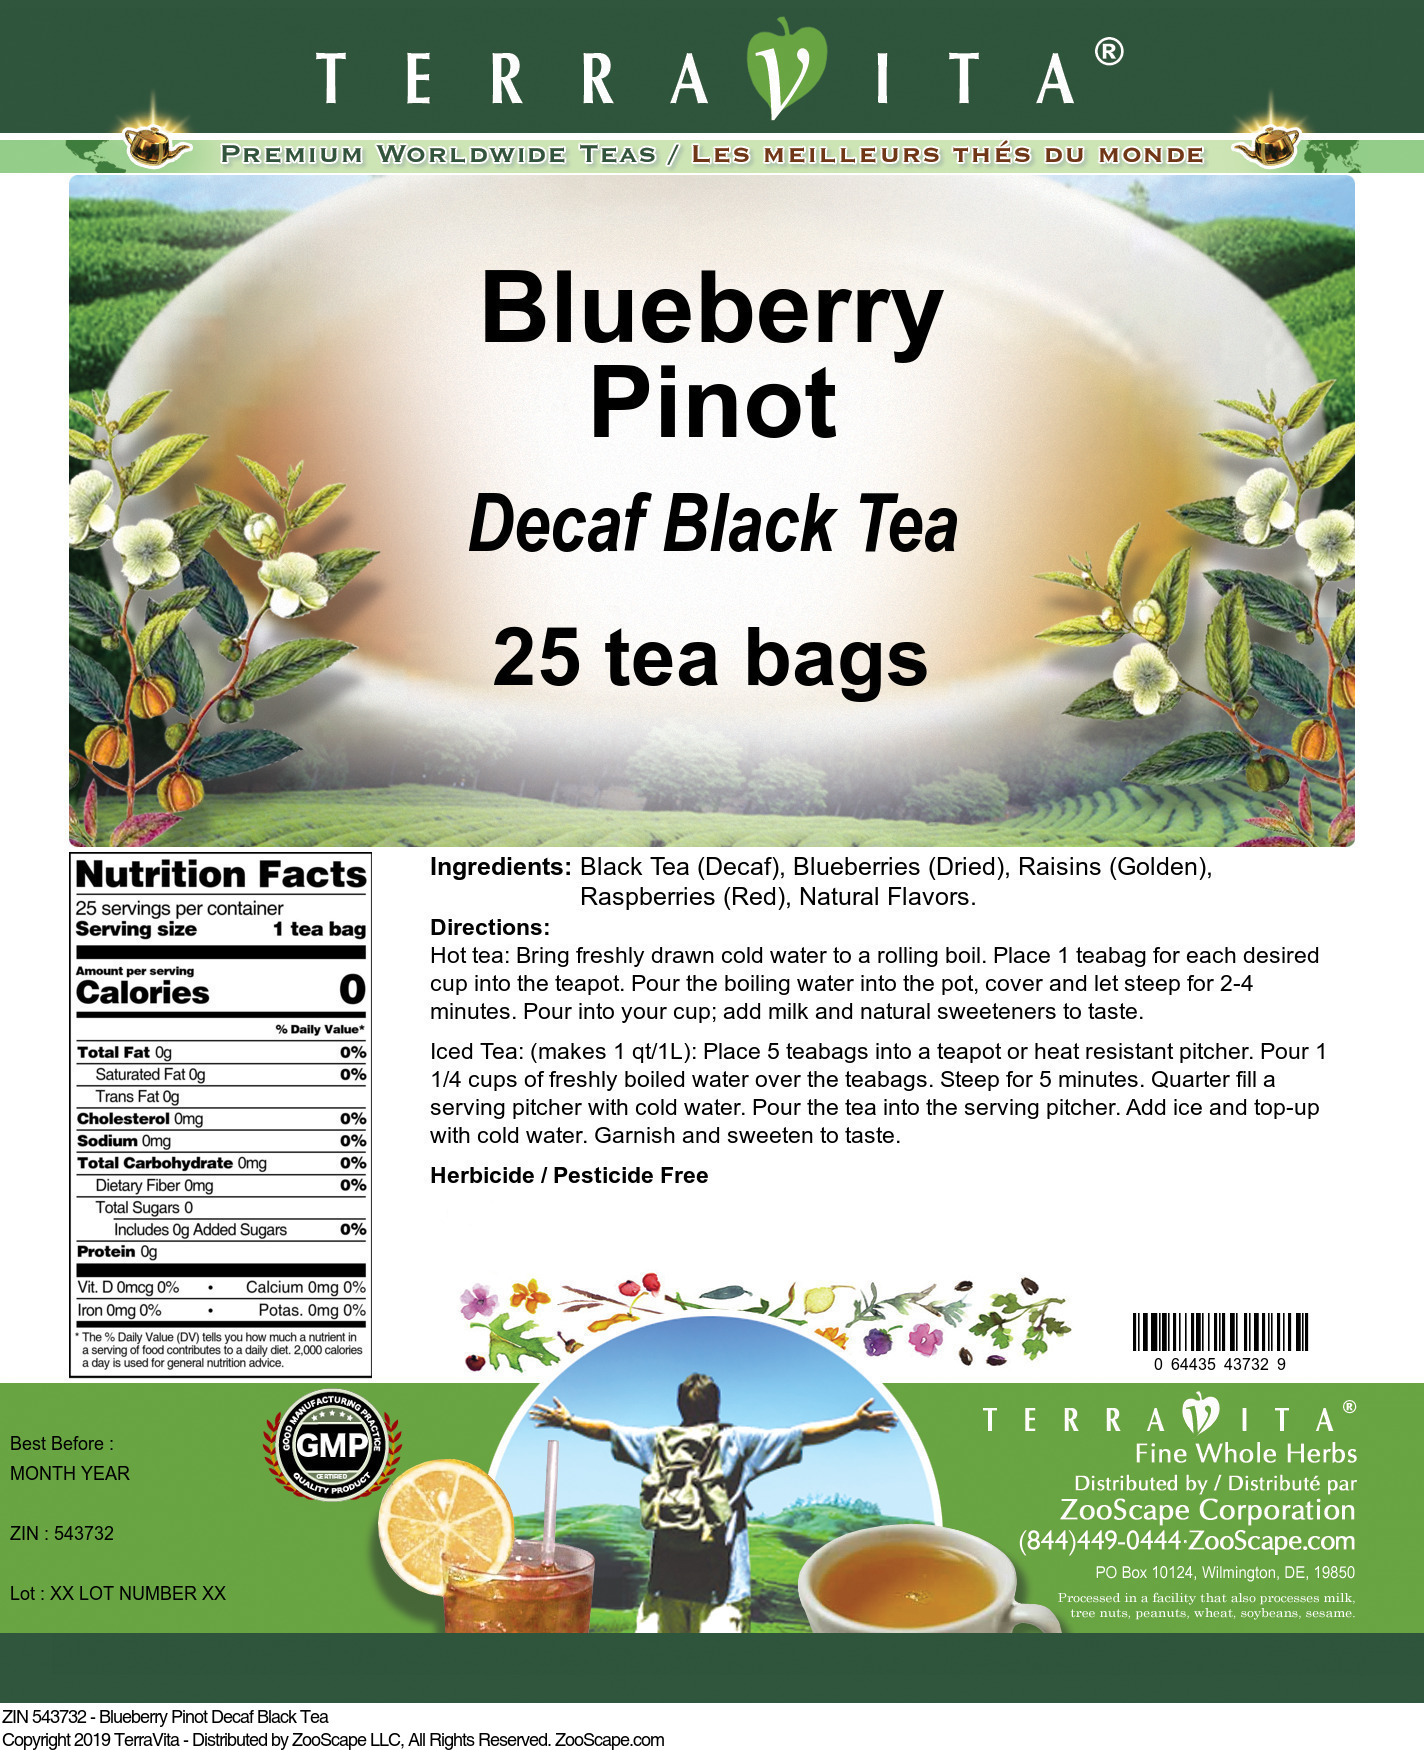 Blueberry Pinot Decaf Black Tea